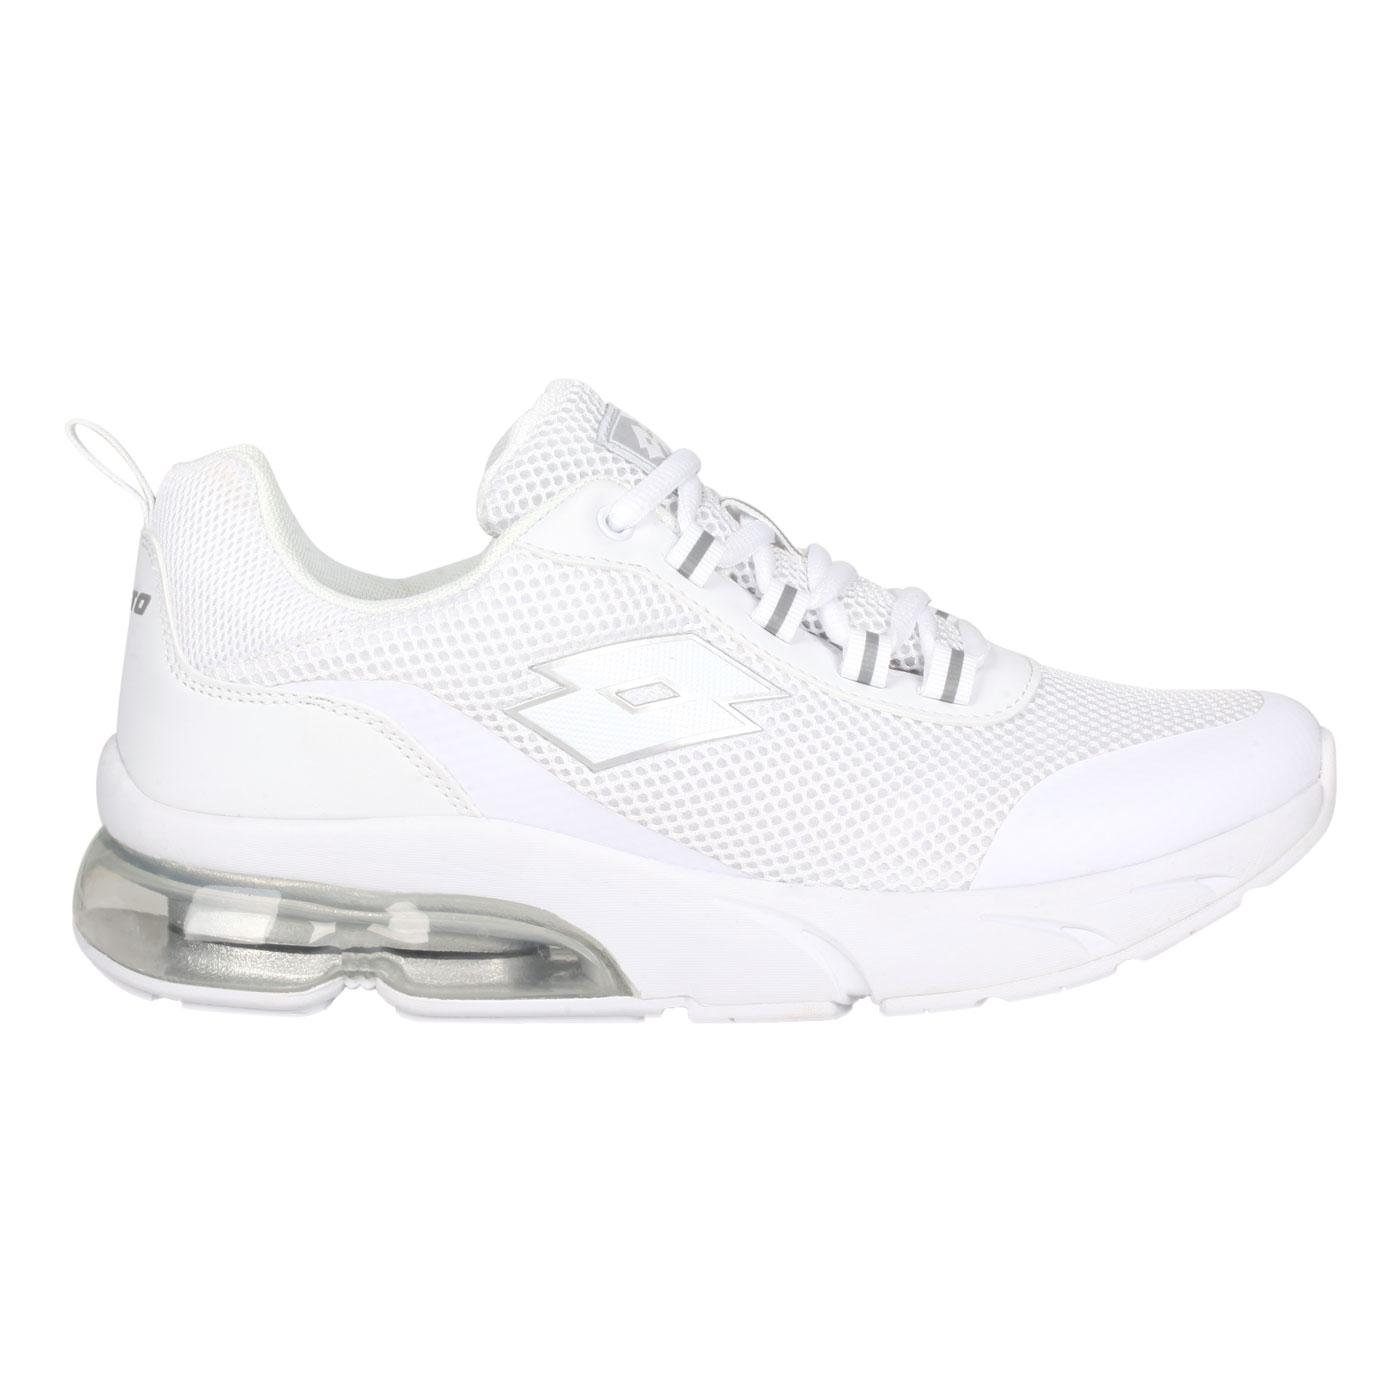 LOTTO 男款AERO POWER II運動鞋 LT1AMR3899 - 白銀